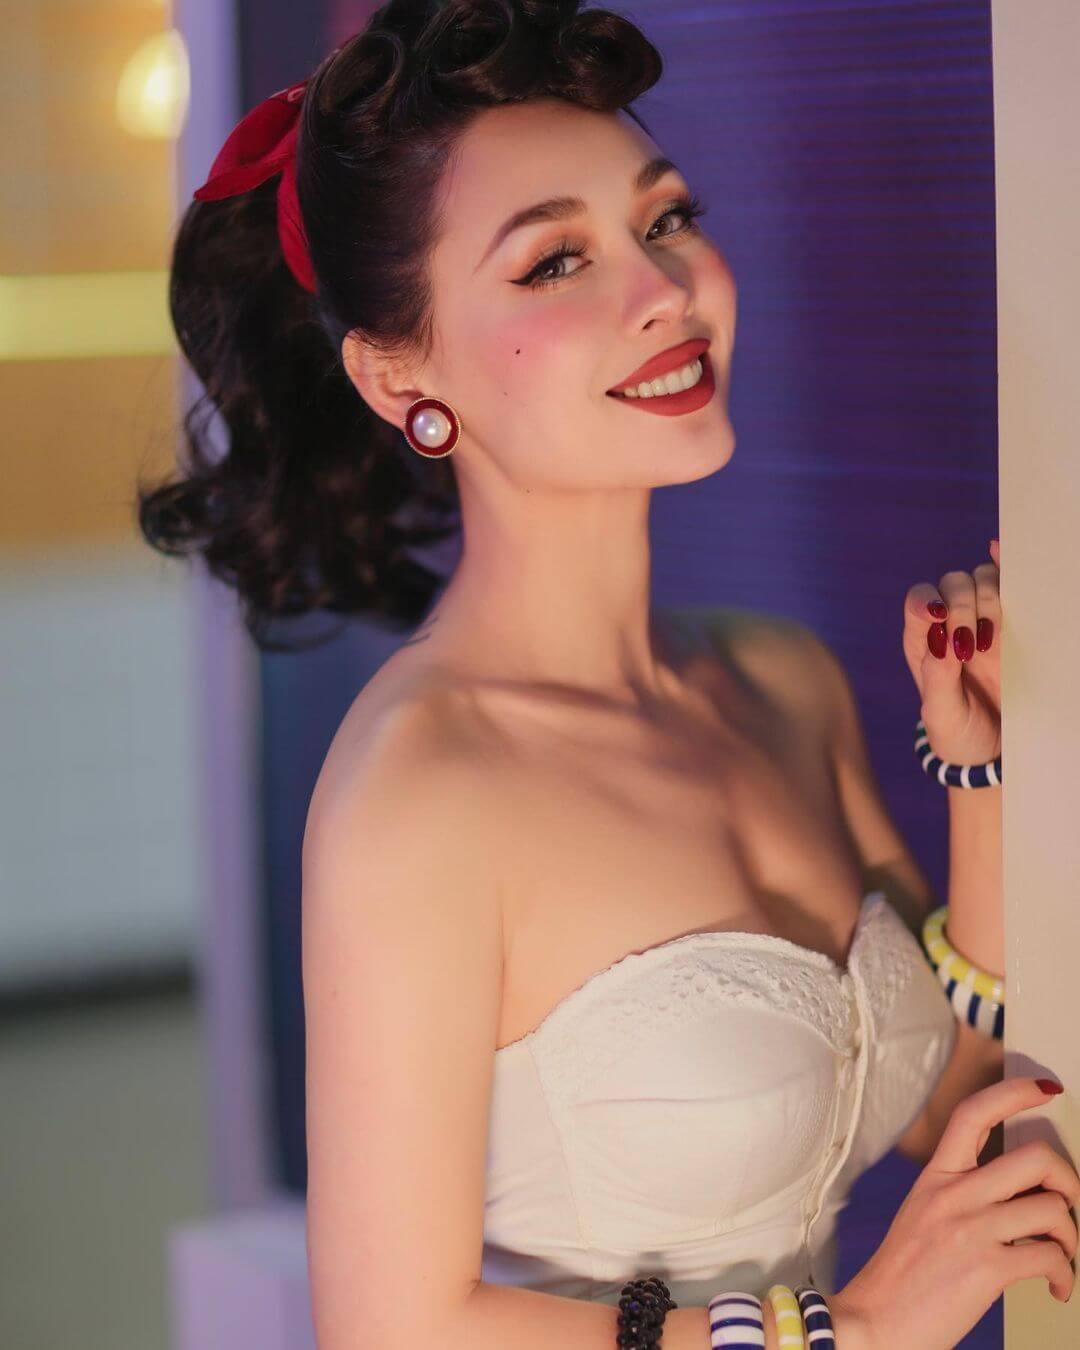 Miss Winny (唯妮)